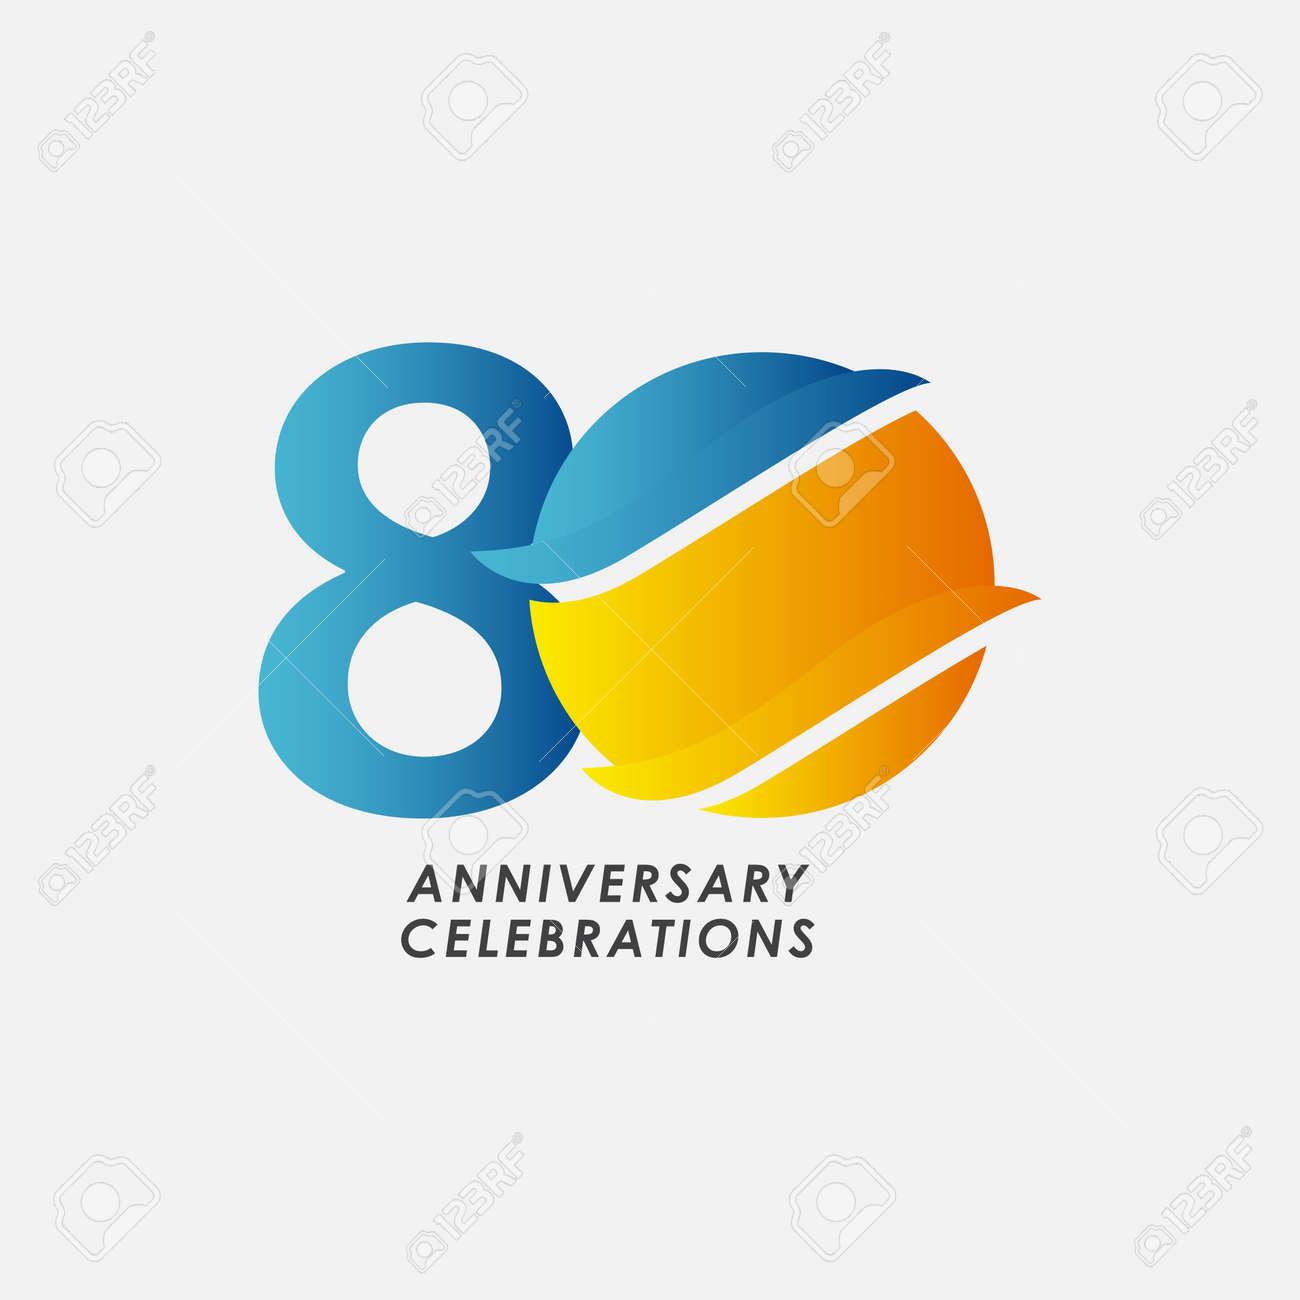 80 Years Anniversary Celebrations Vector Template Design Illustration - 163697992